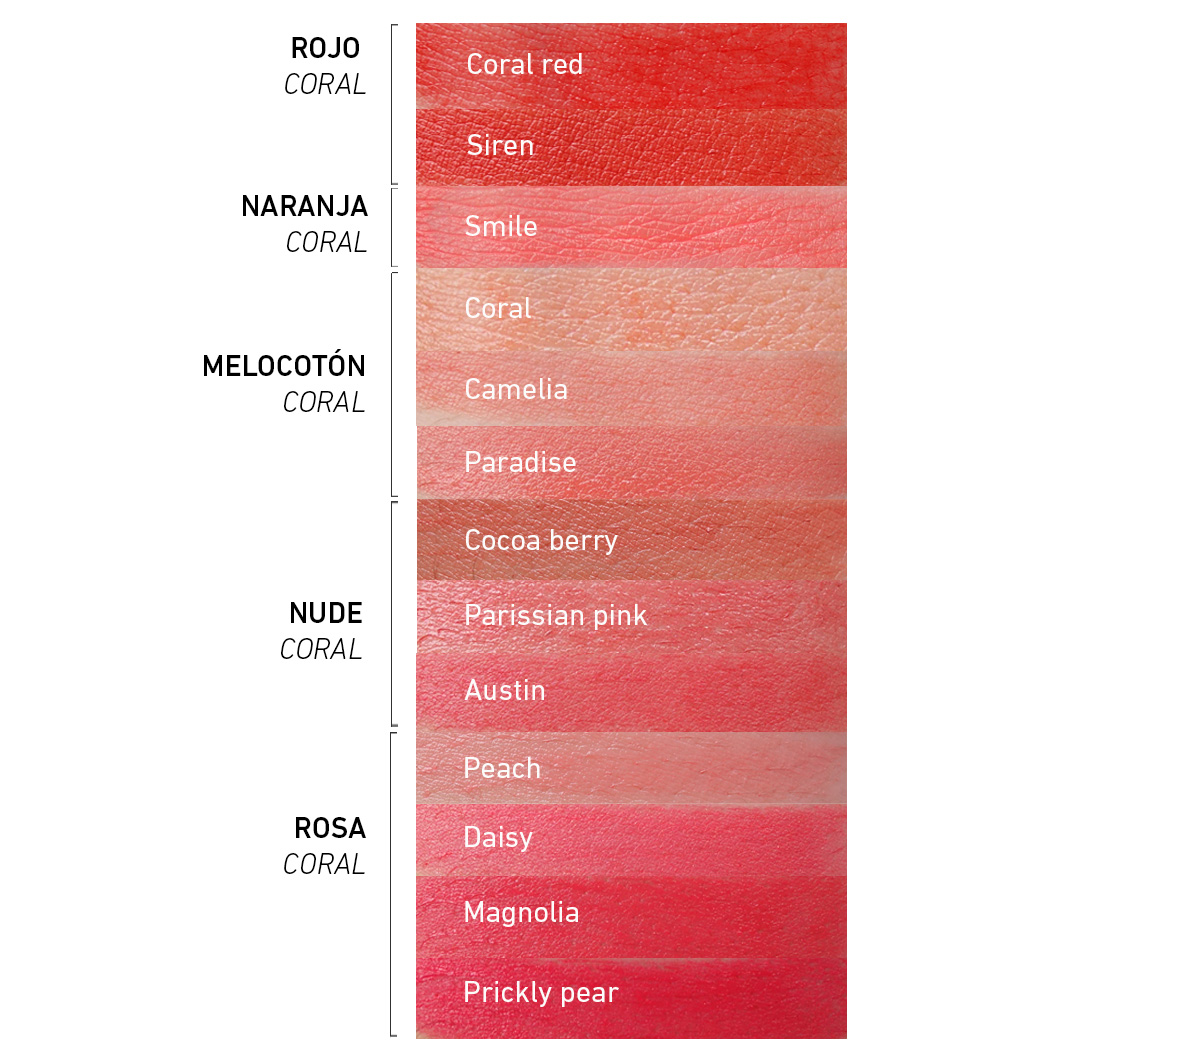 Coral organic lipstick - pintalabios coral orgánico 2